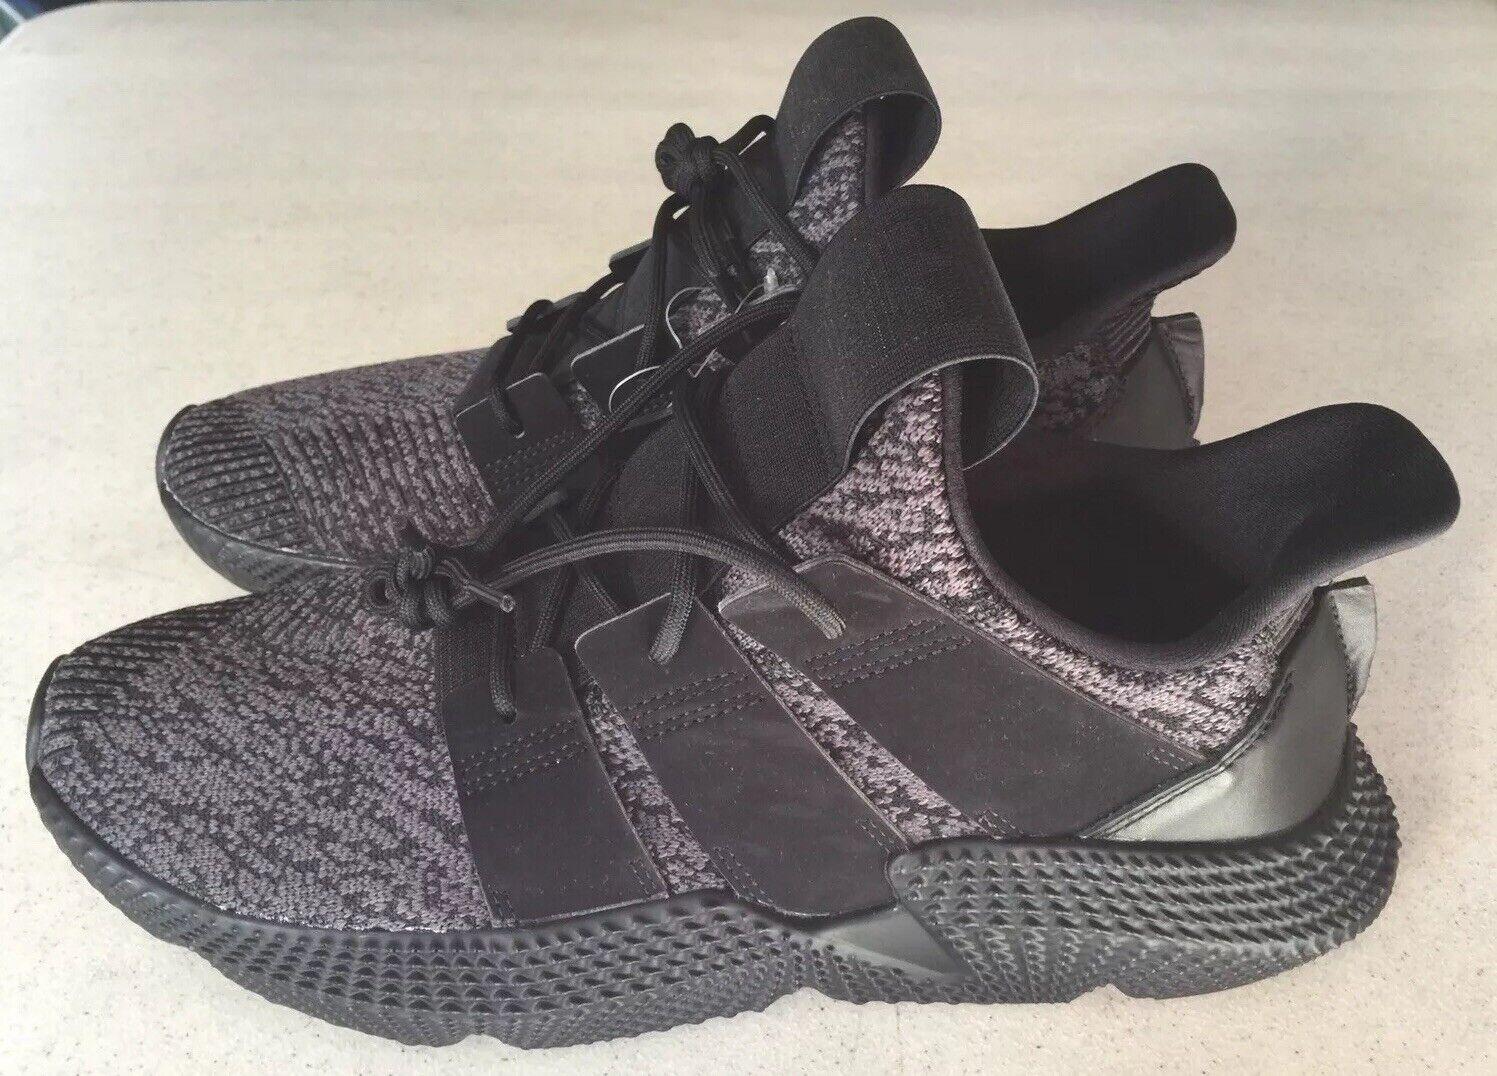 Adidas Originals Prophere Silueta Hombre Zapatos De Atletismo CQ2126 US 10